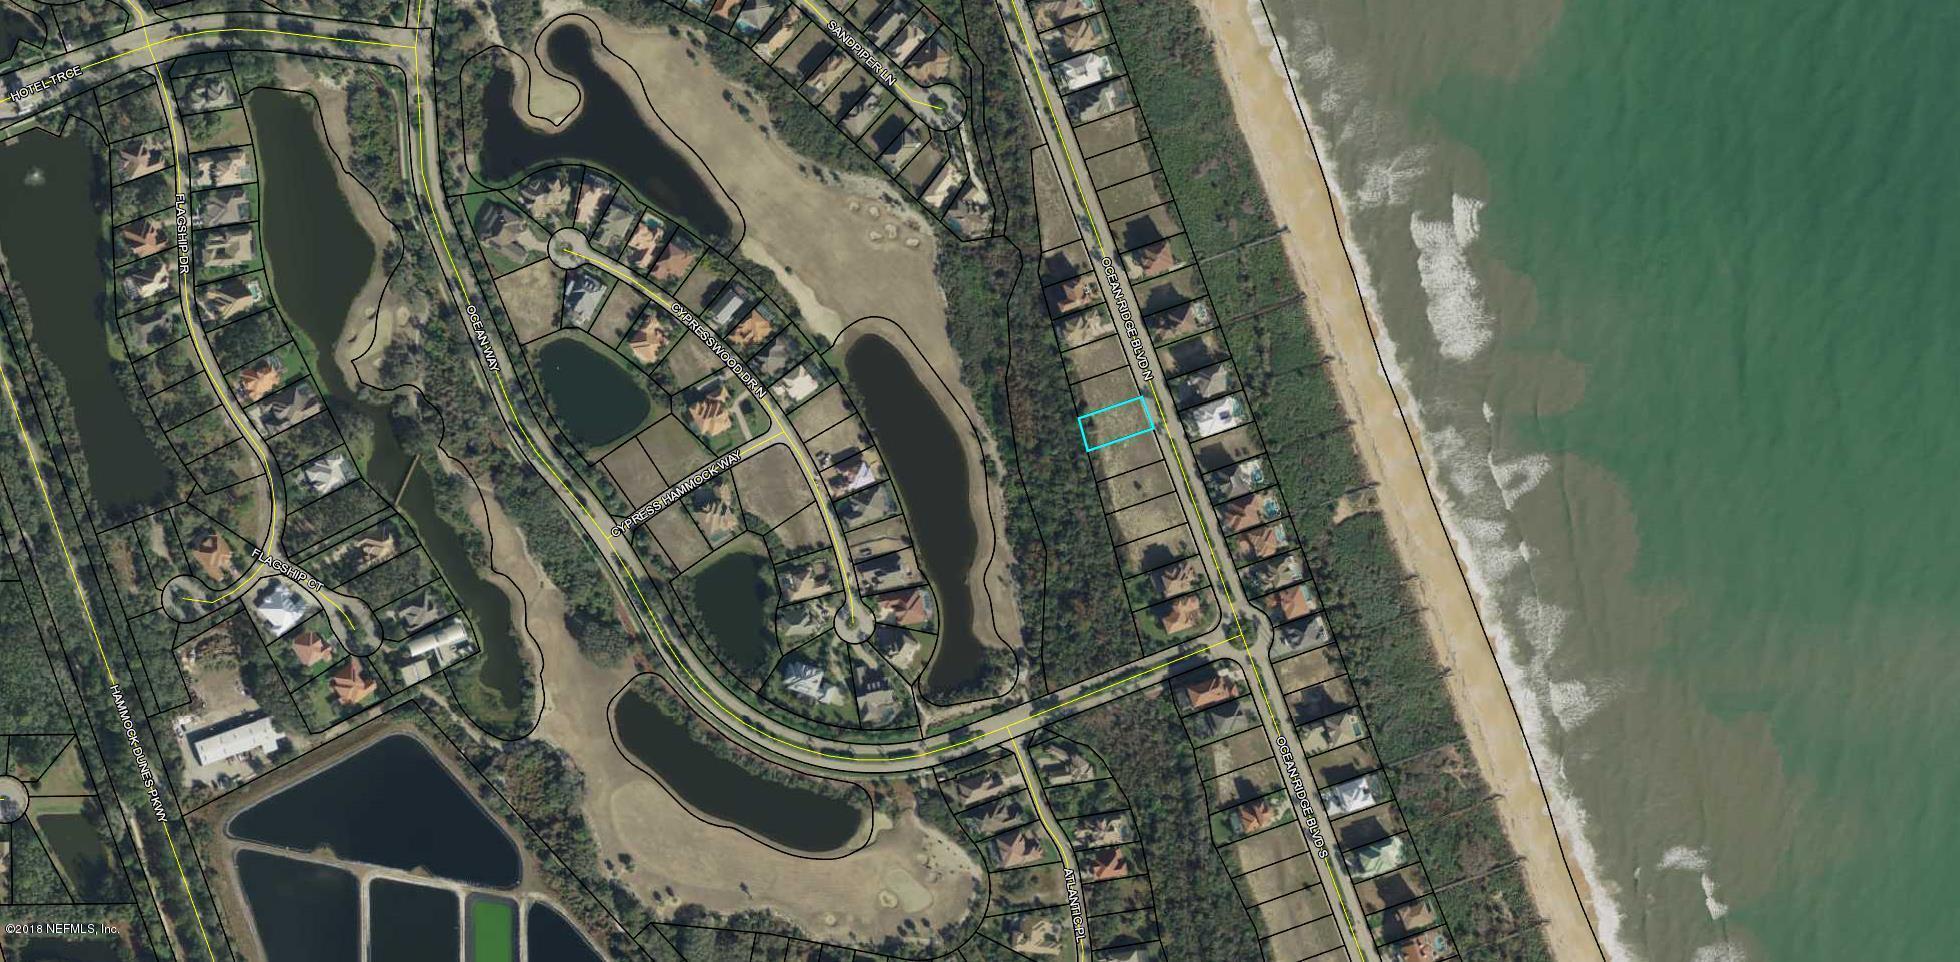 13 OCEAN RIDGE, PALM COAST, FLORIDA 32137, ,Vacant land,For sale,OCEAN RIDGE,968339